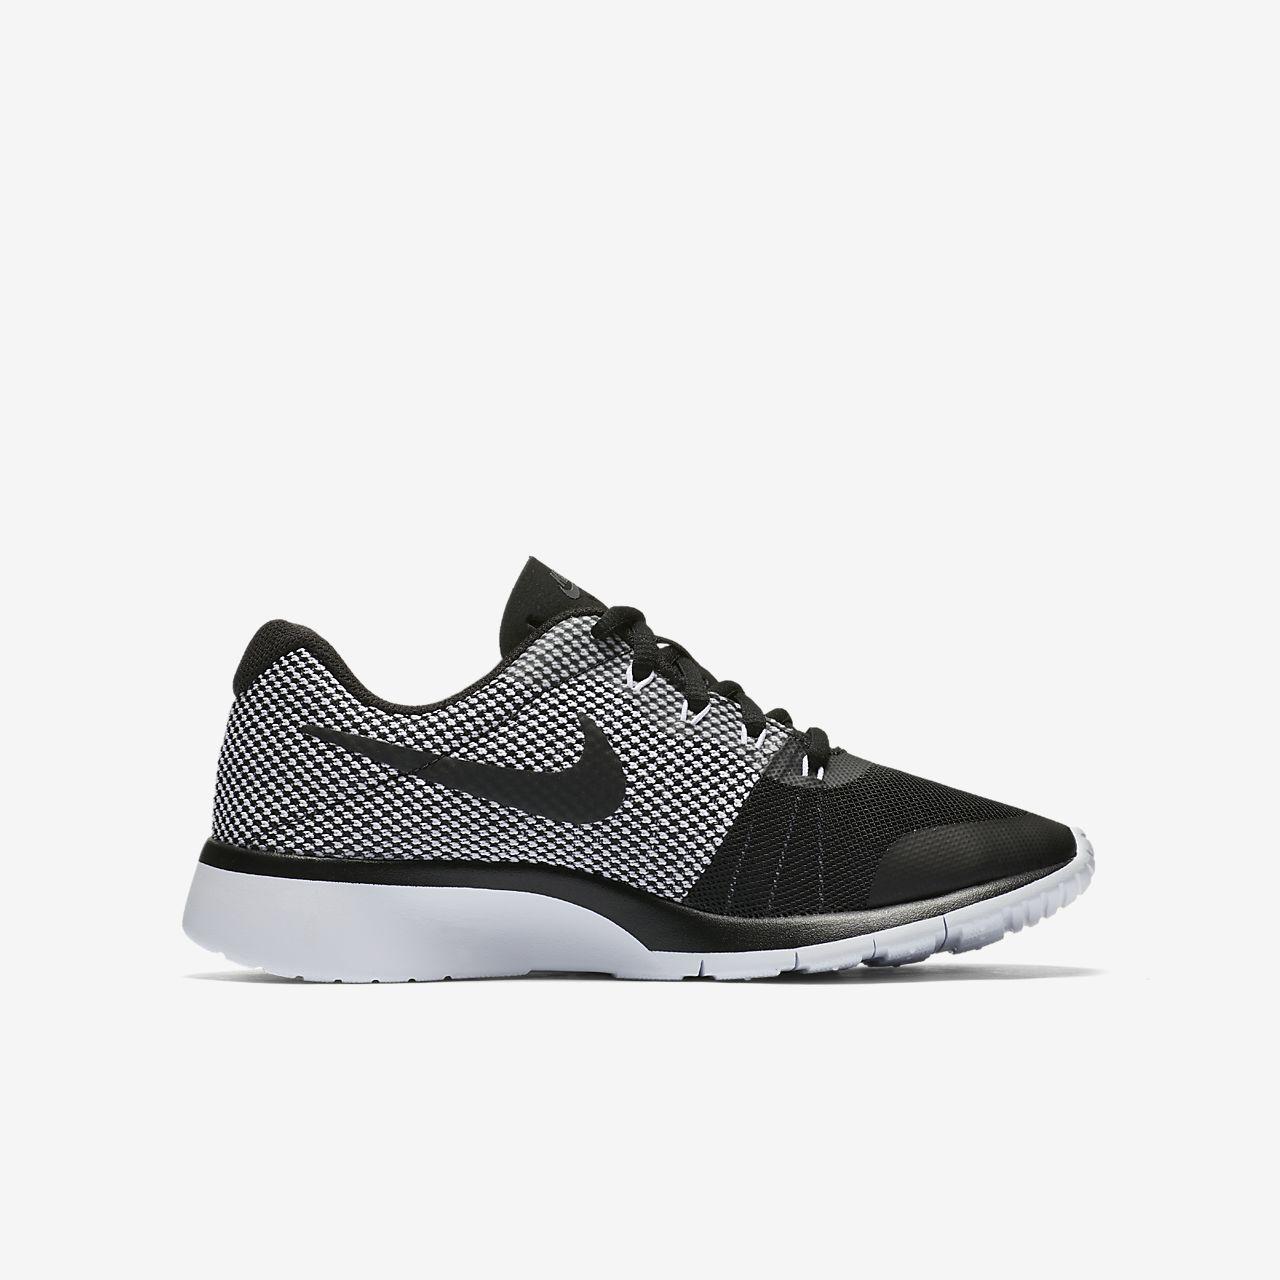 ... Nike Tanjun Racer Schuh für ältere Kinder